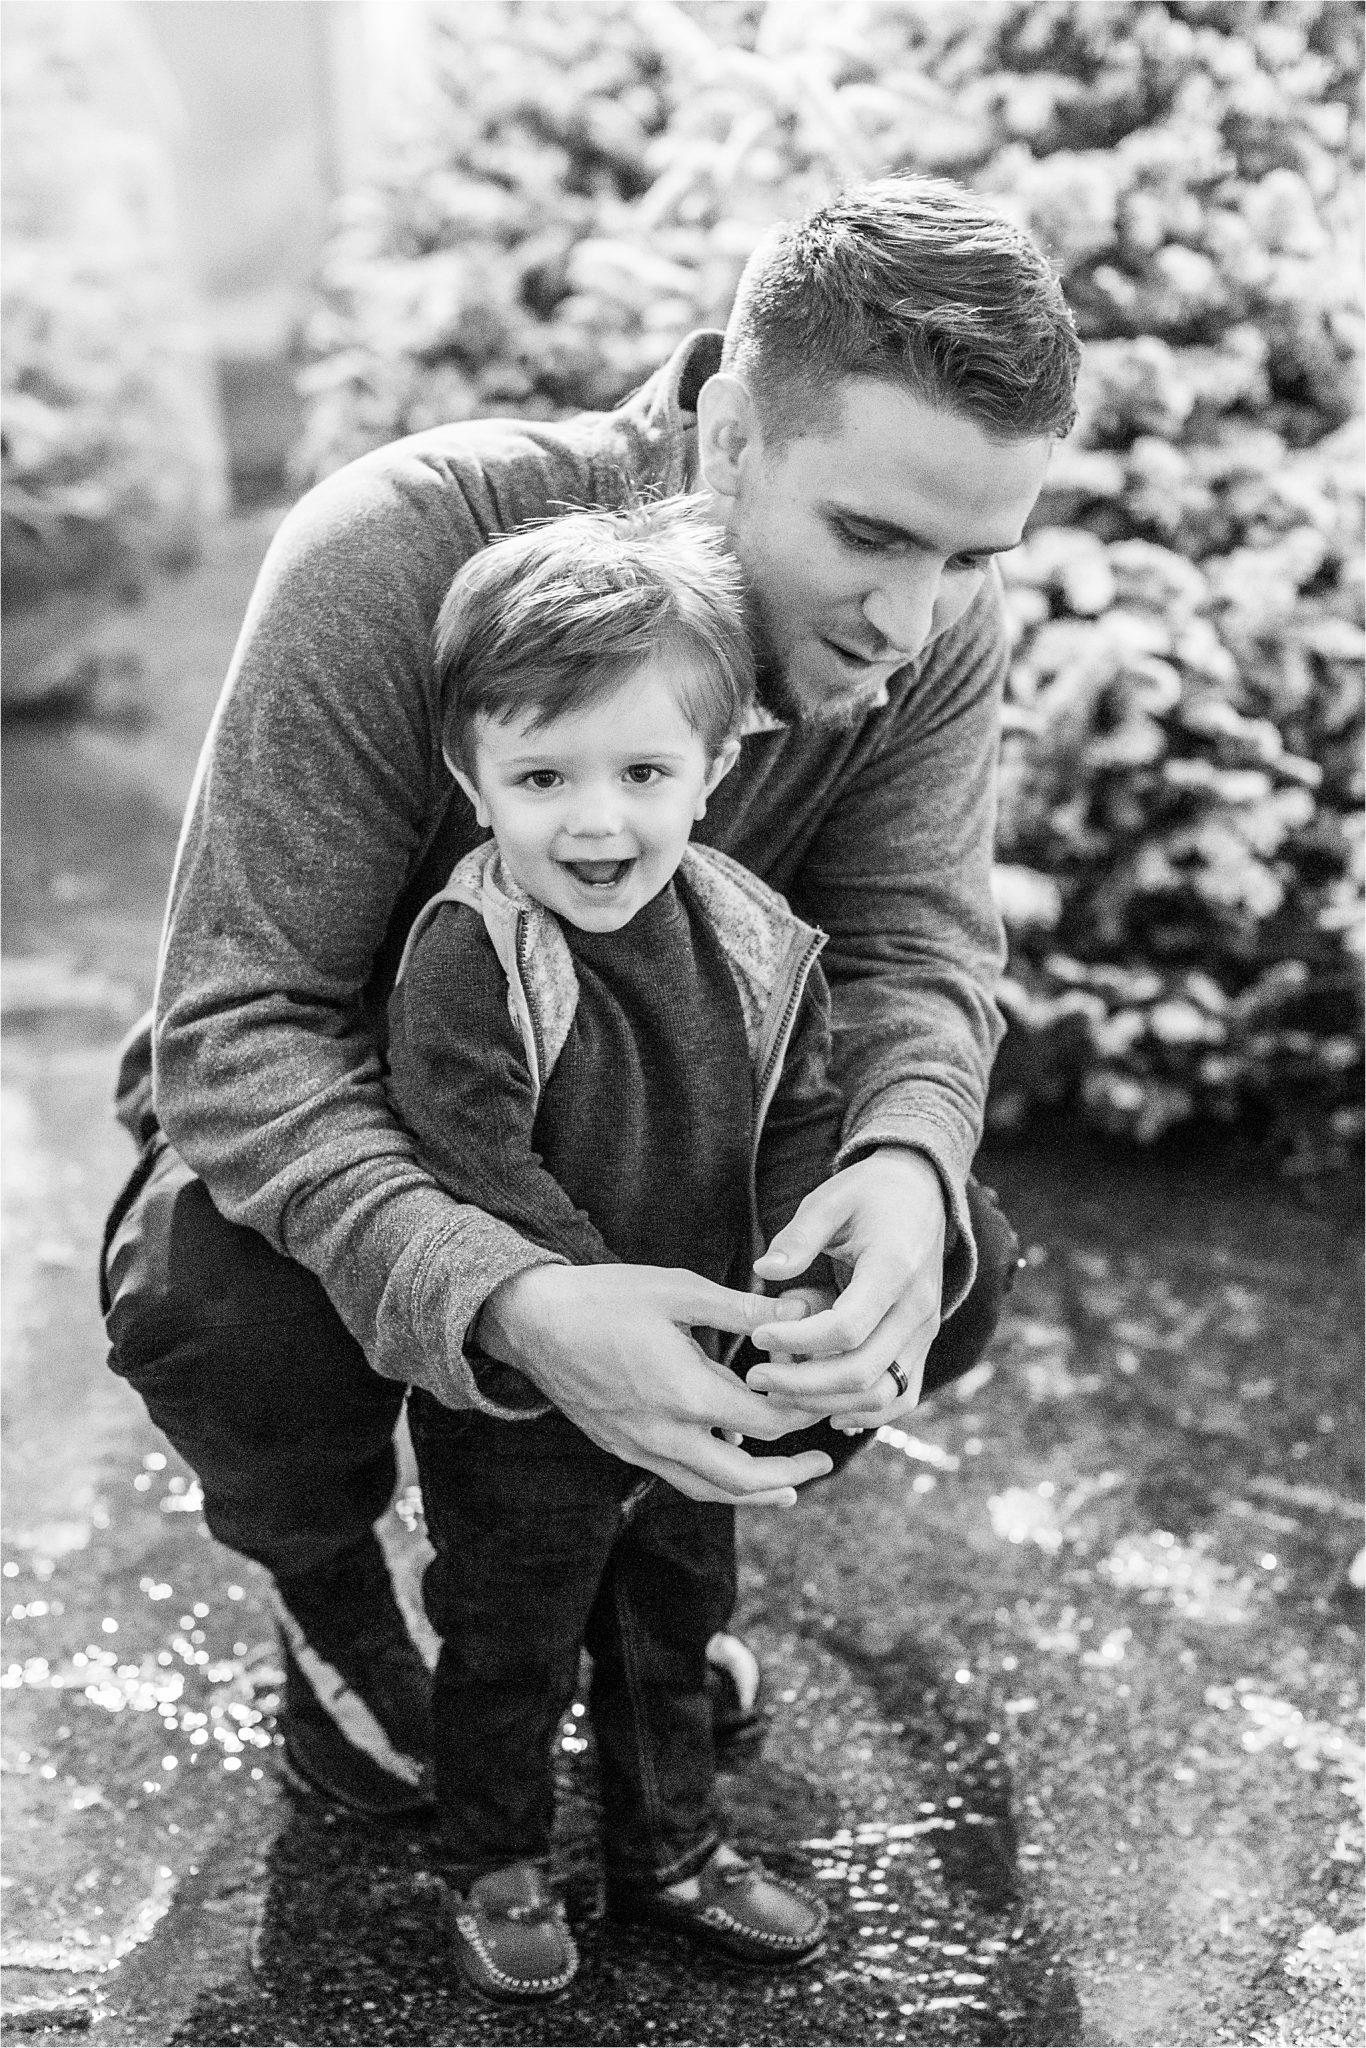 alabama-family-photographer-portraits-holiday-cards-christmas-father-son